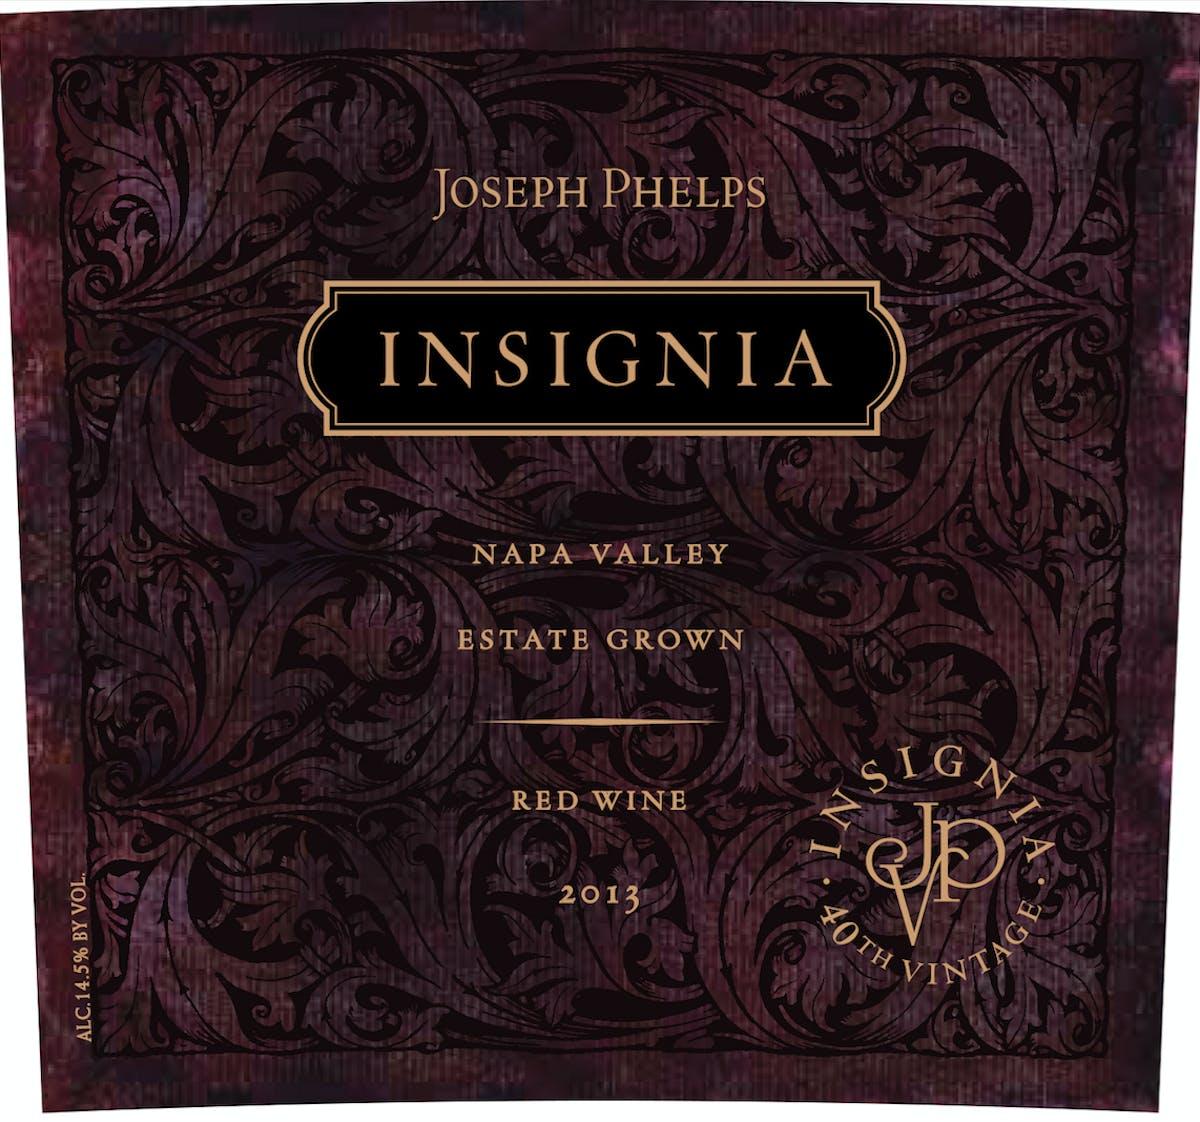 Joseph Phelps Insignia 2013 The Grape Tray